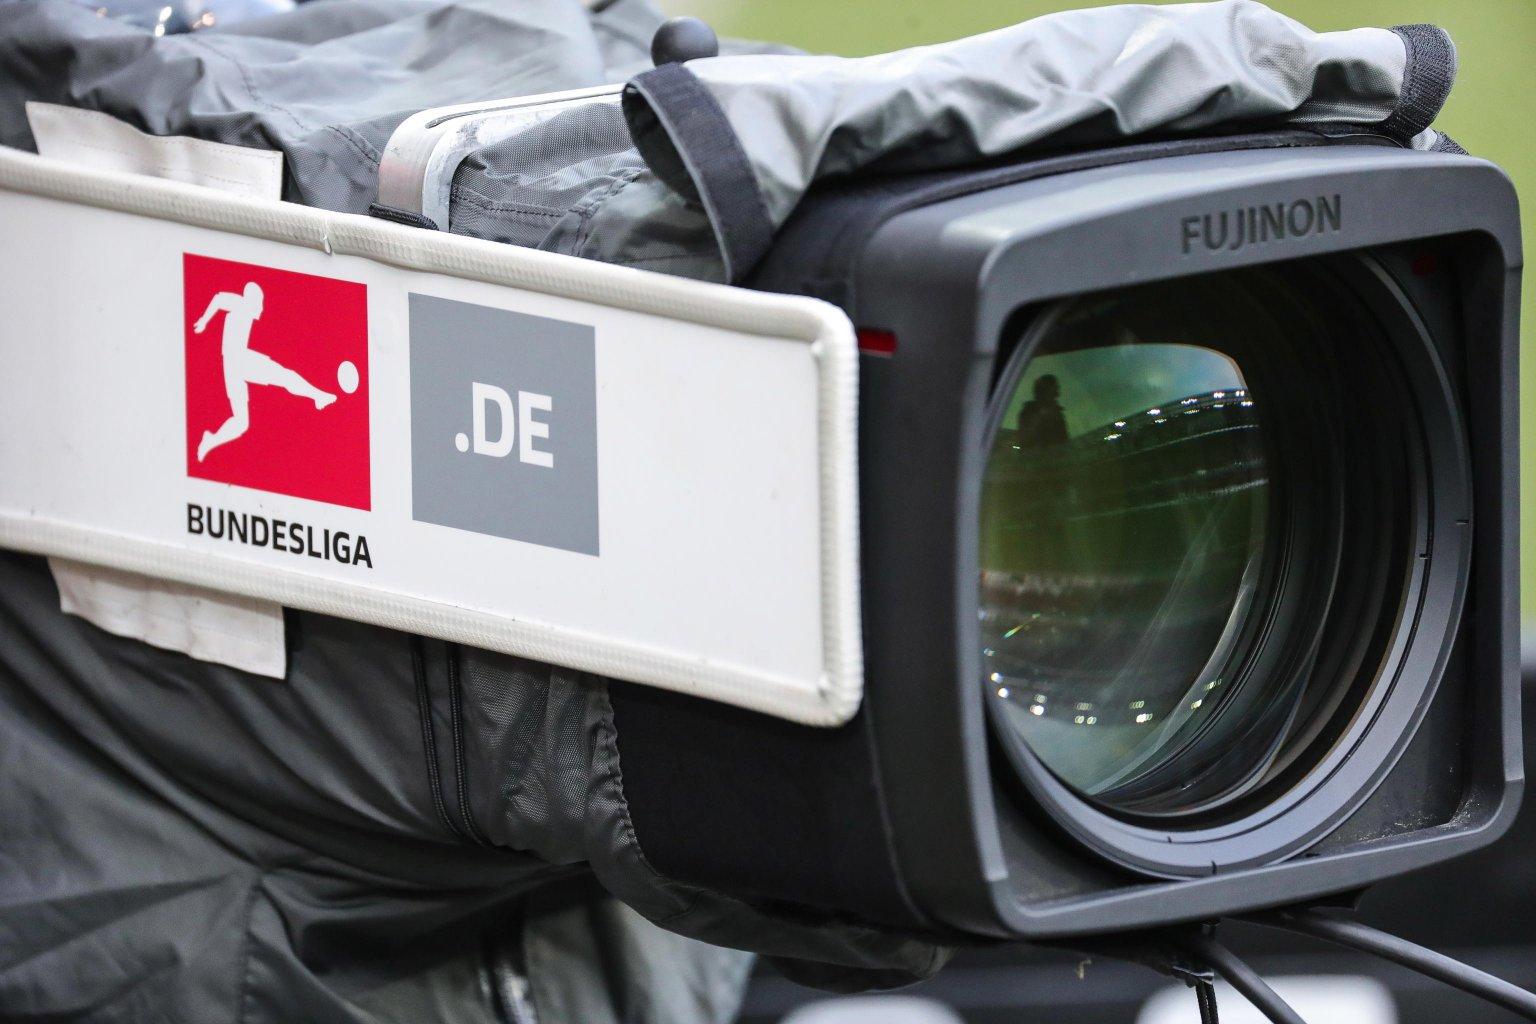 Calcio, sabato 16 riparte la Bundesliga in diretta streaming su NOW TV